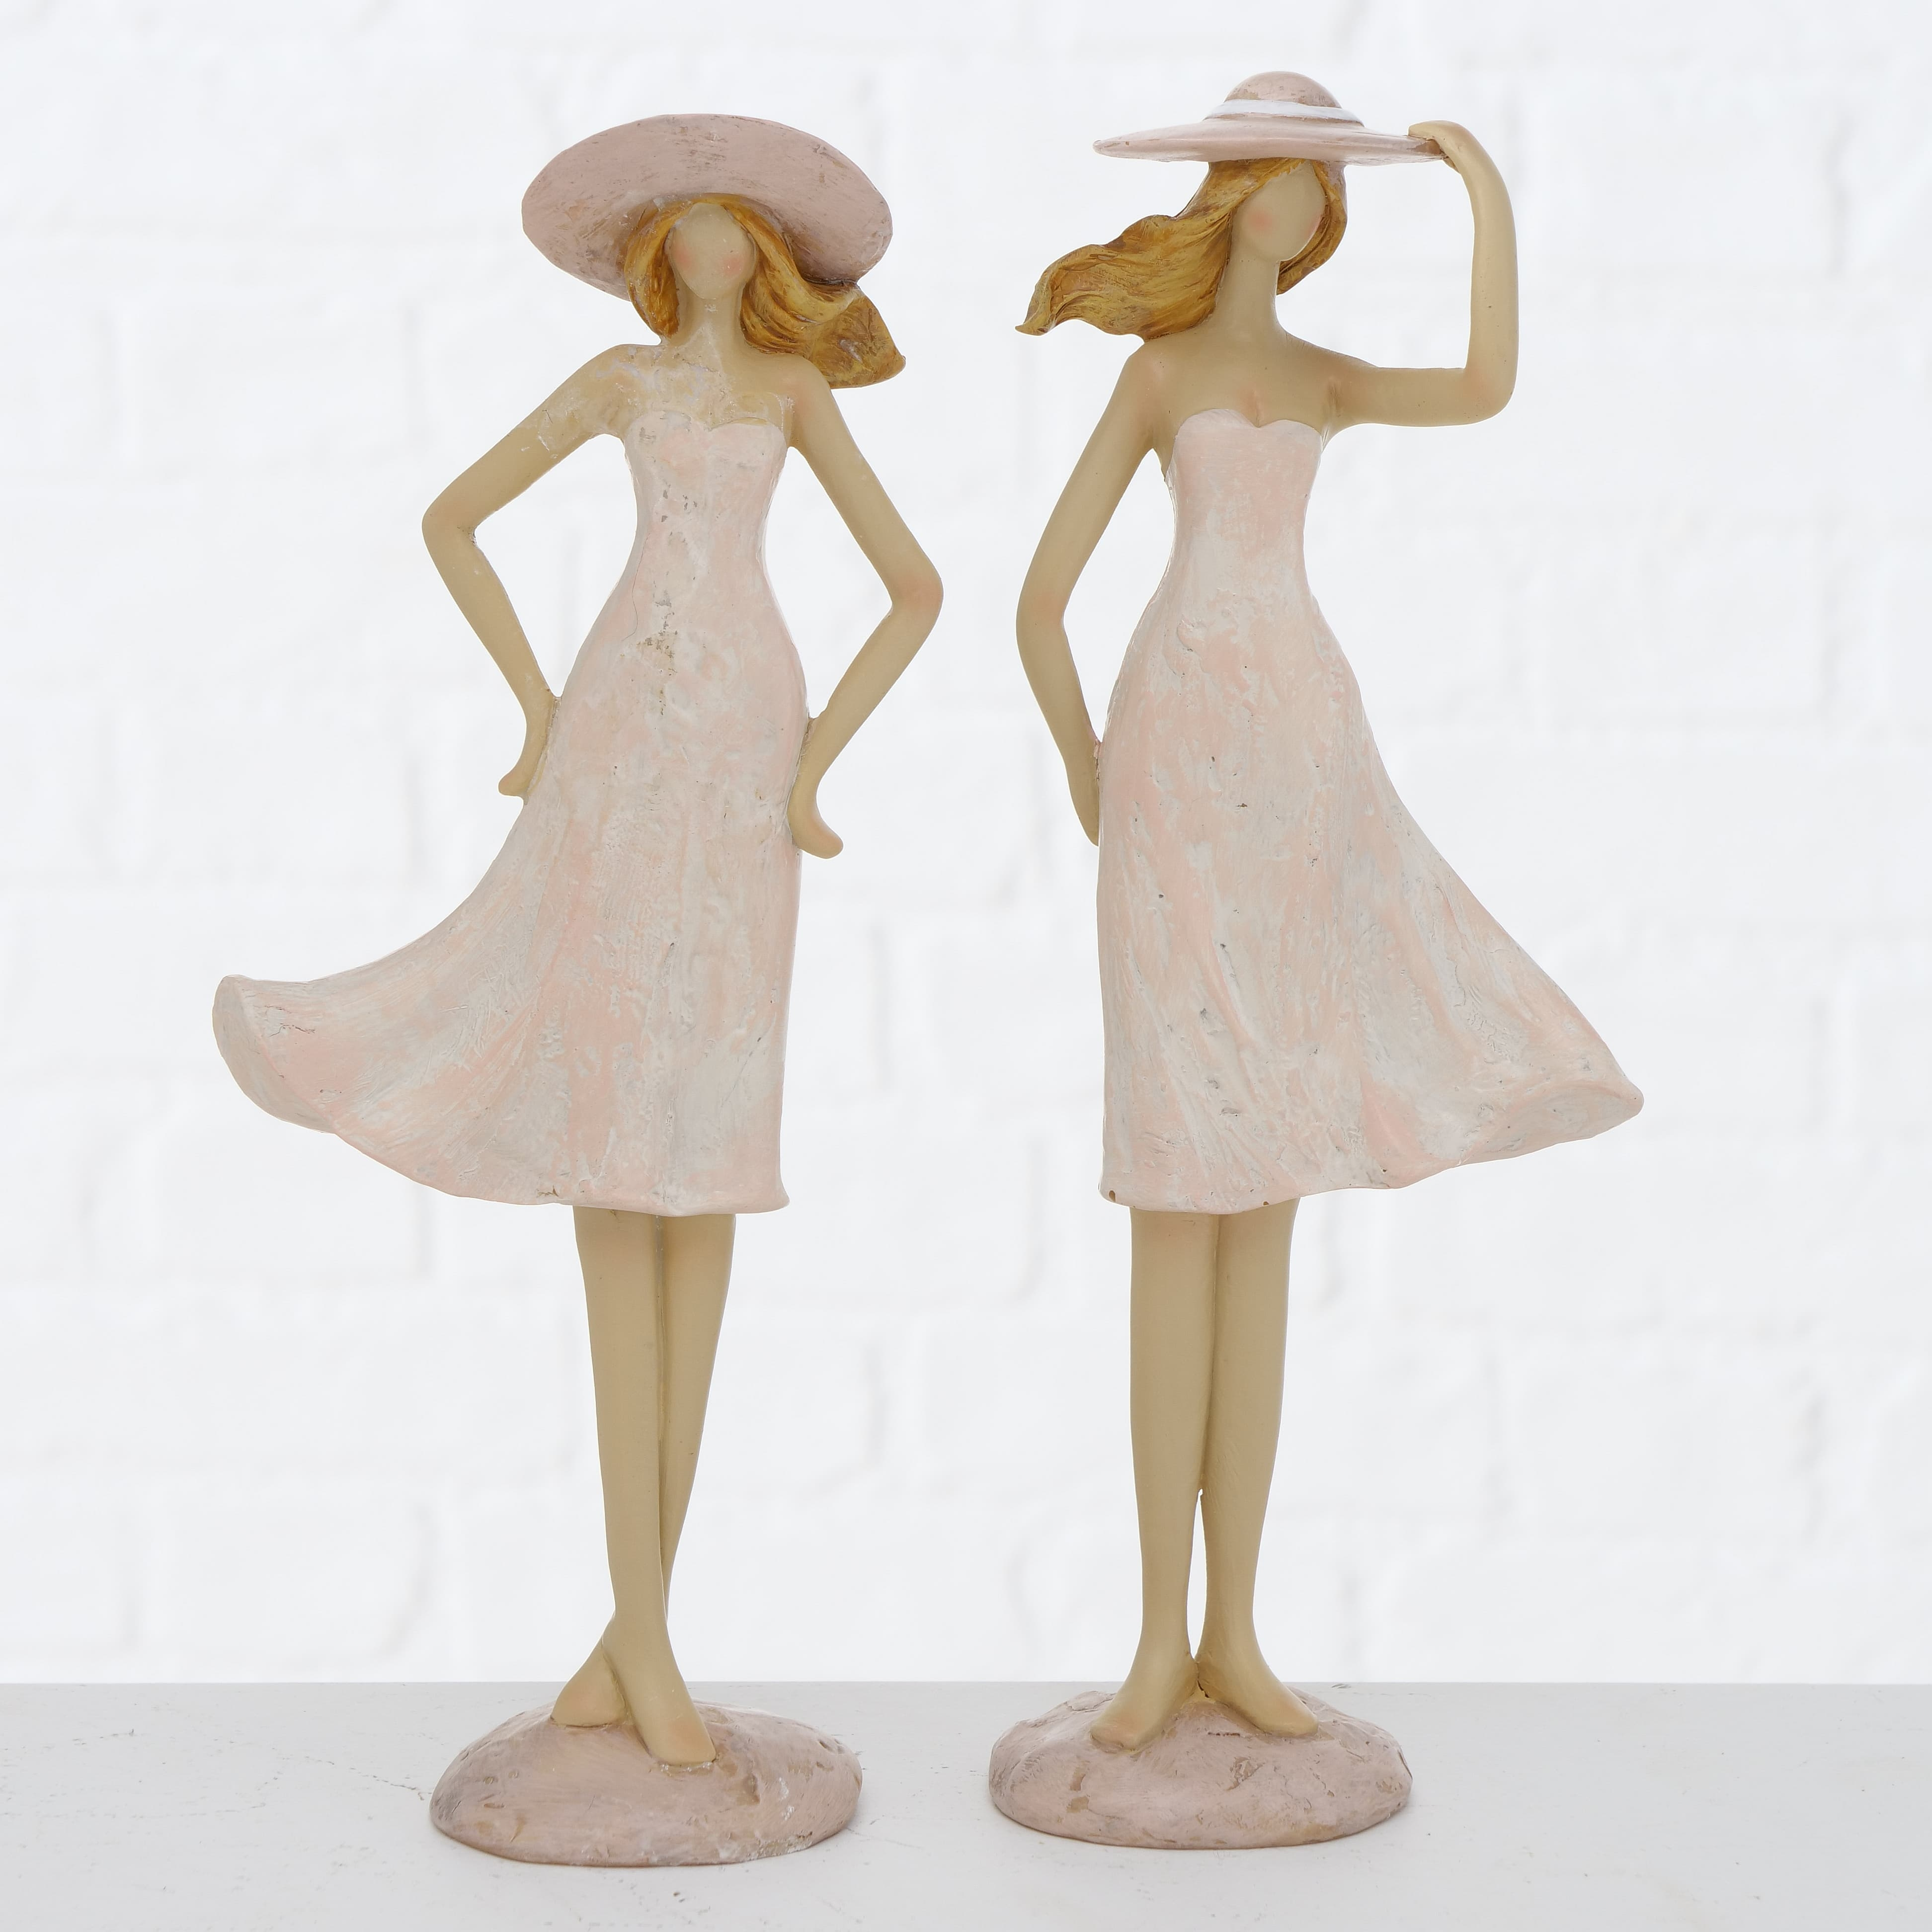 Decoratiune din polirasina Mikela Roz deschis, Modele Asortate, l10xA5xH25 cm poza